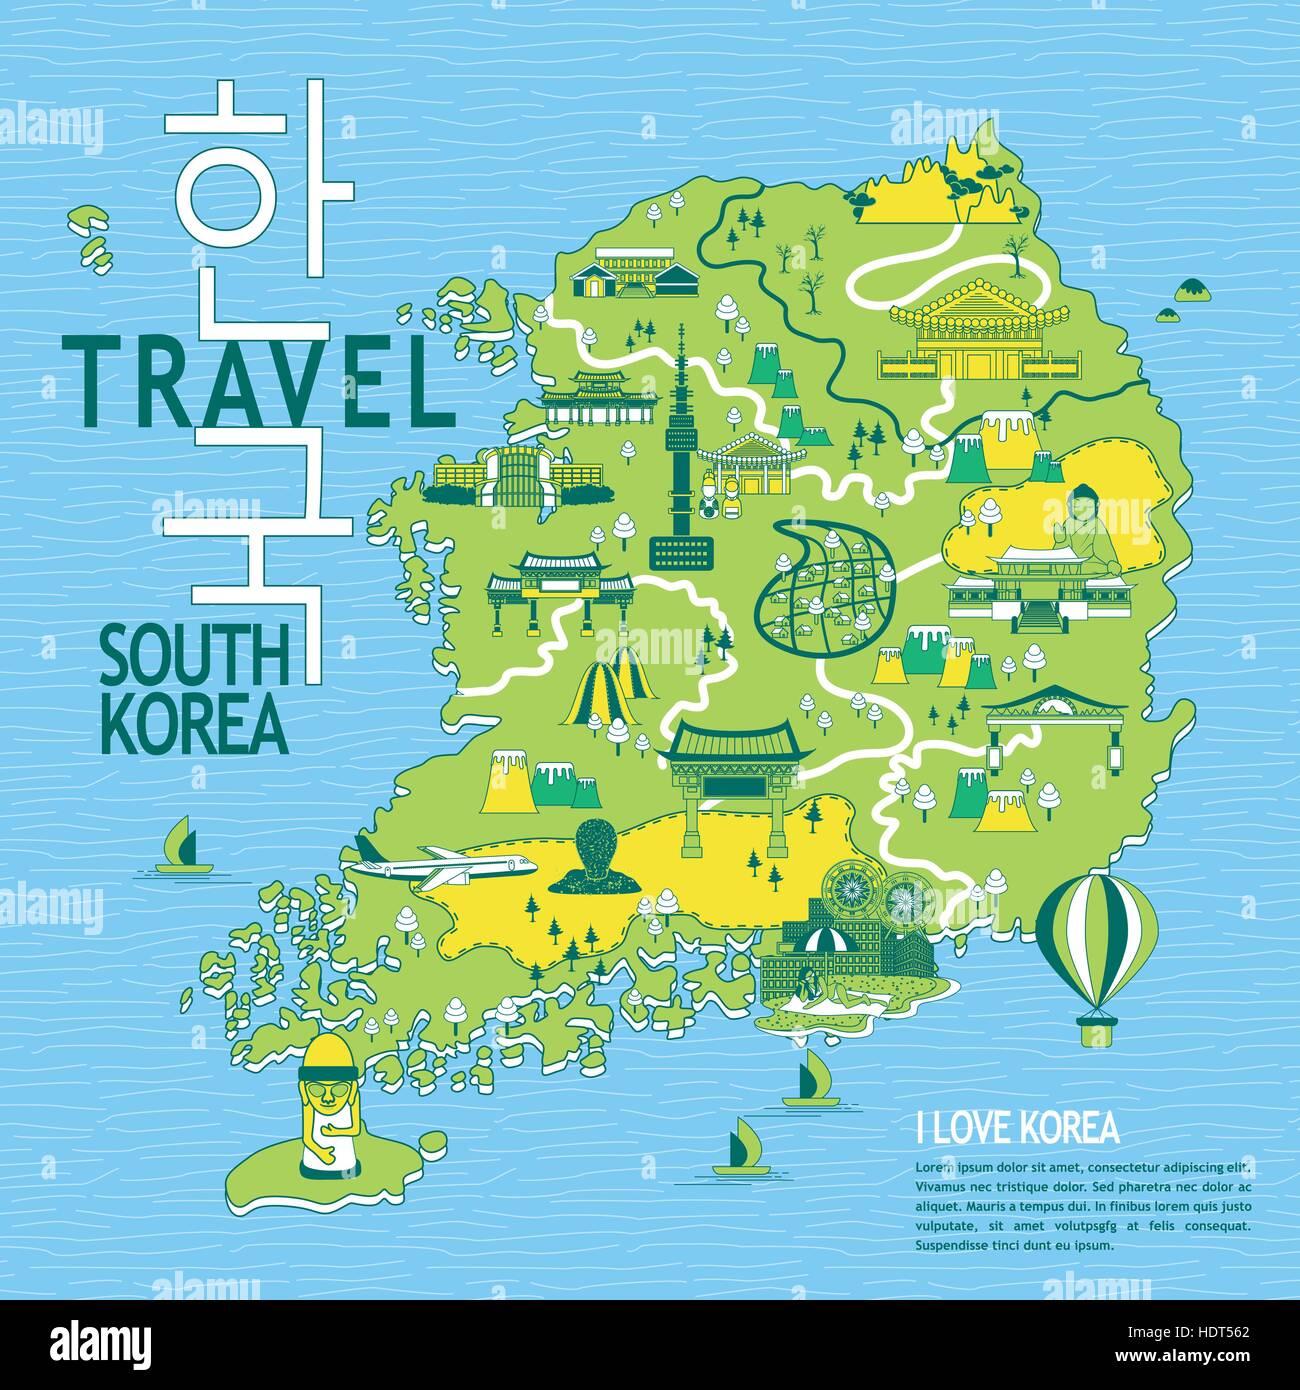 Korea Map on seoul map, euro countries map, wwii map, formosa map, hong kong map, russia map, china map, united states map, europe map, asia map, camp humphreys map, persia map, ireland map, rwanda map, usa map, korean war map, korean peninsula map, iran map, japan map,